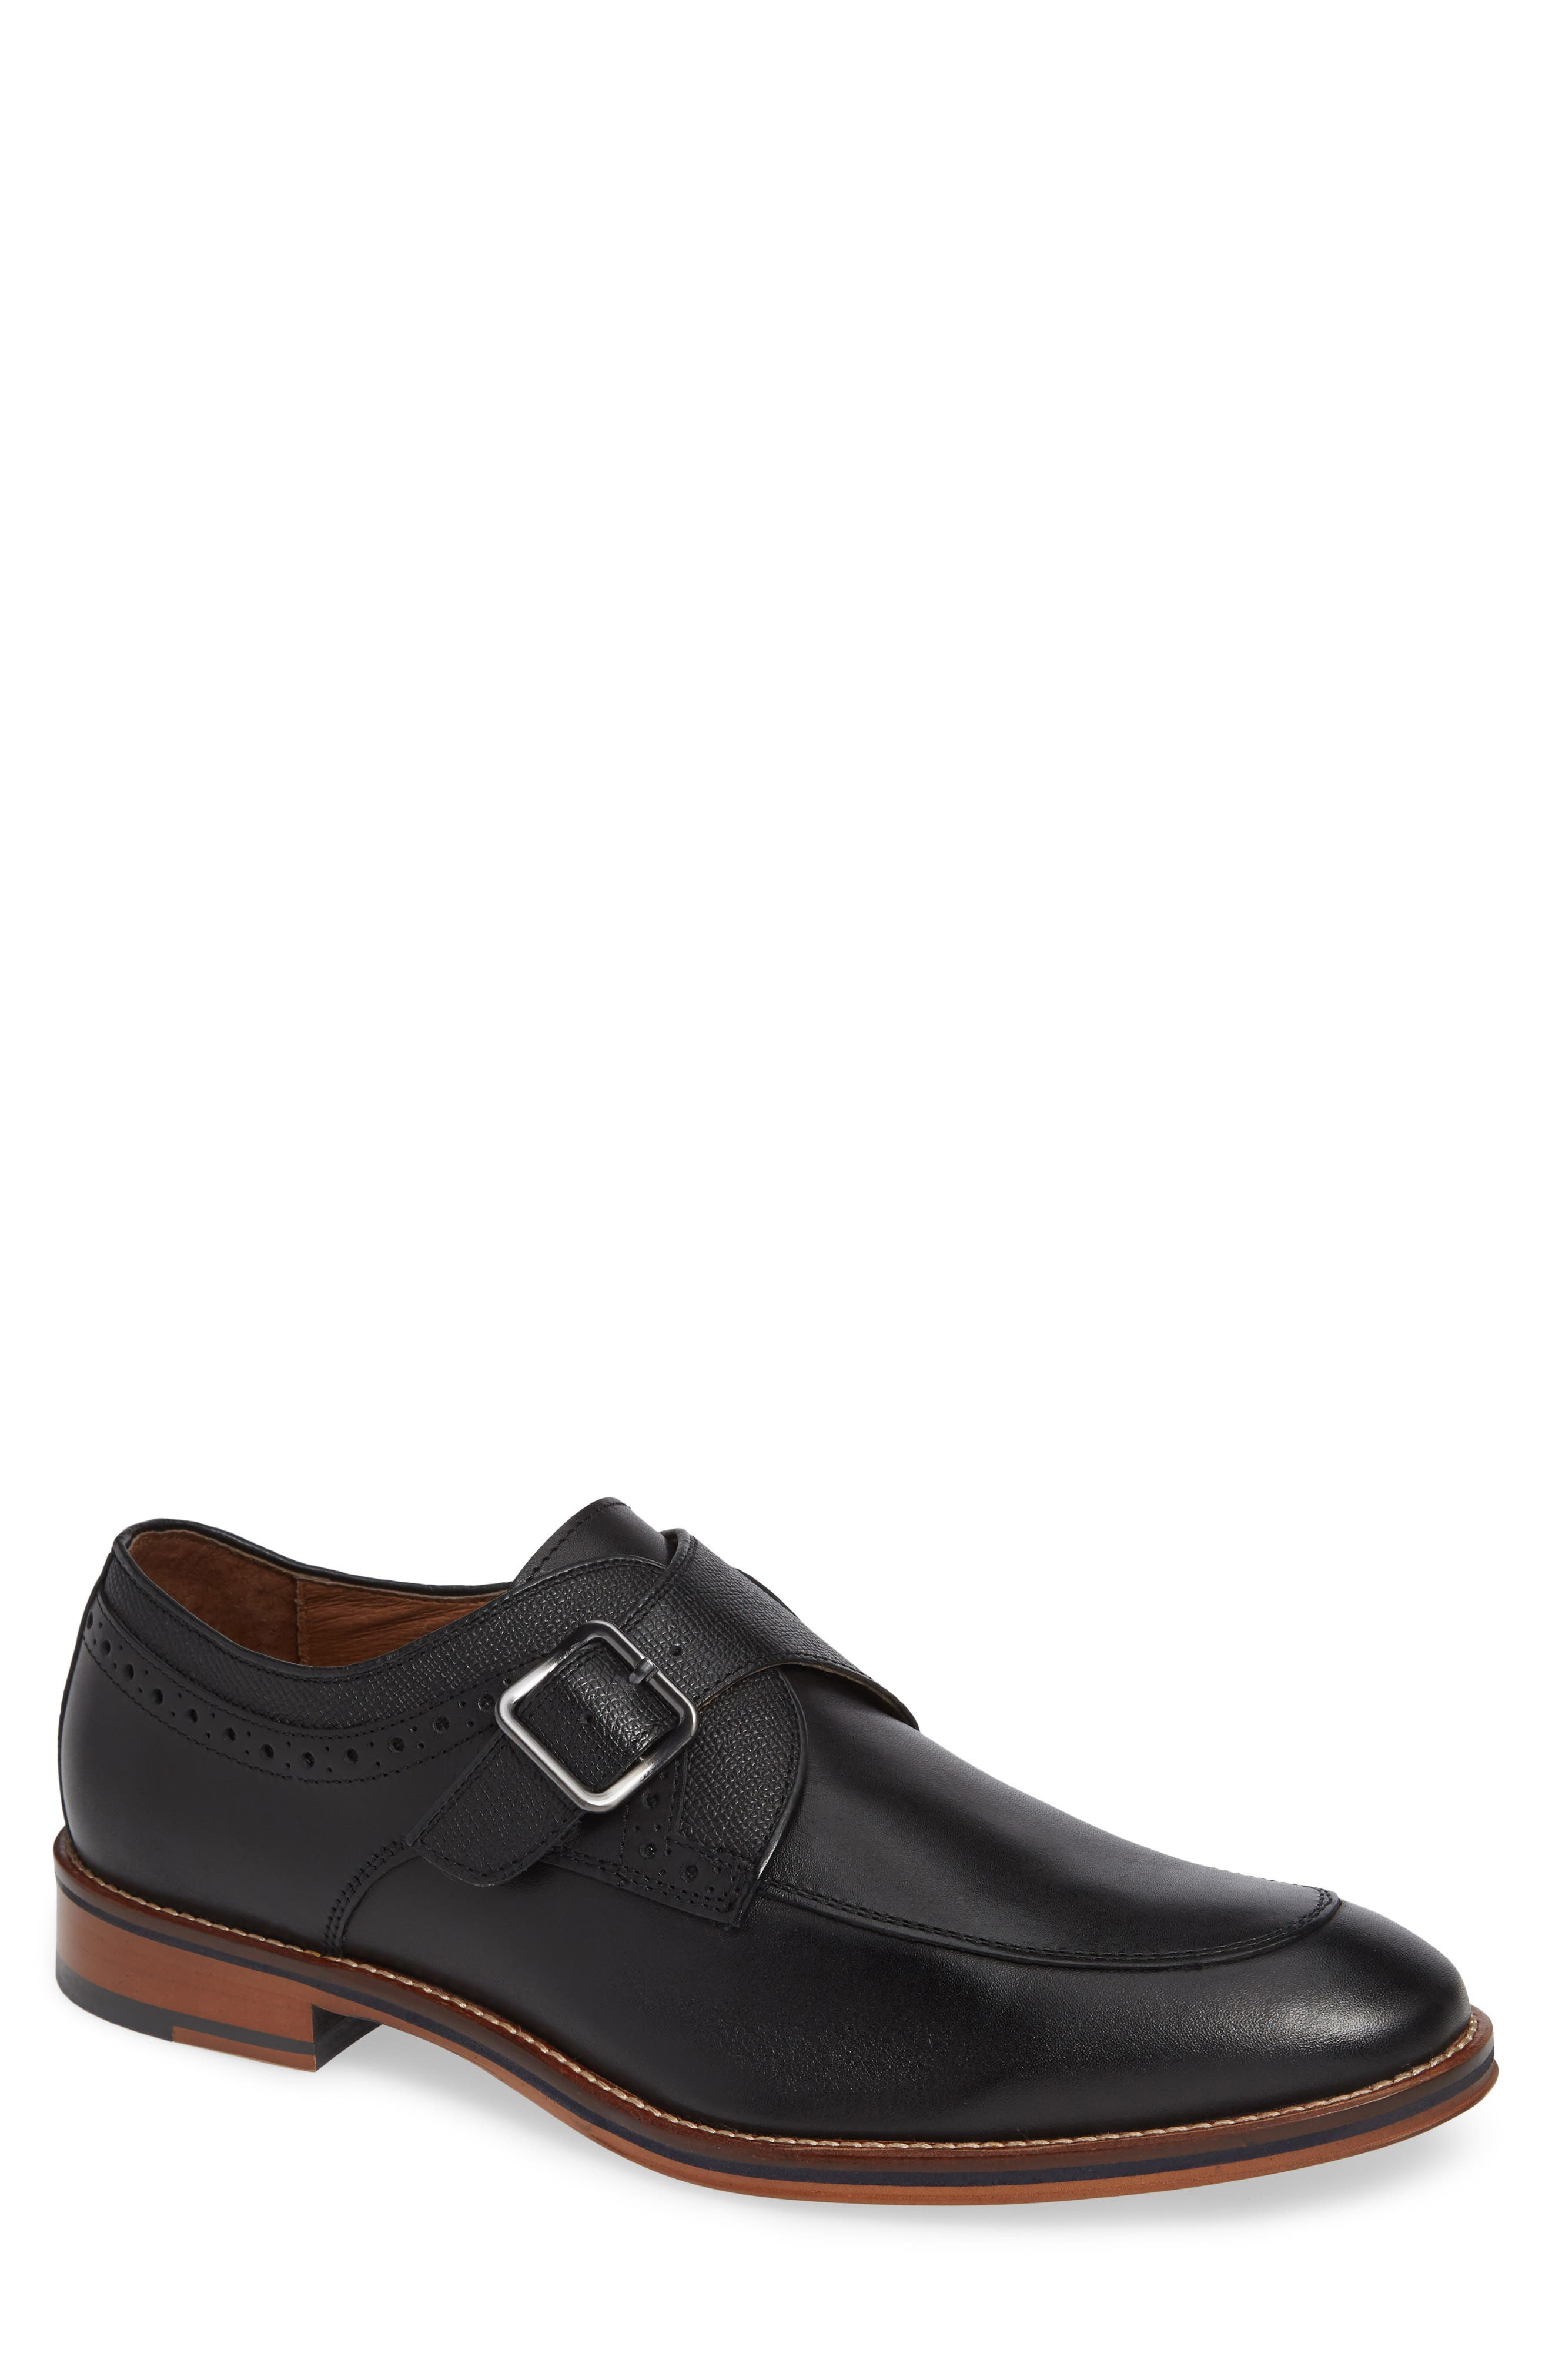 Conard Monk Strap Shoe,                             Main thumbnail 1, color,                             BLACK LEATHER